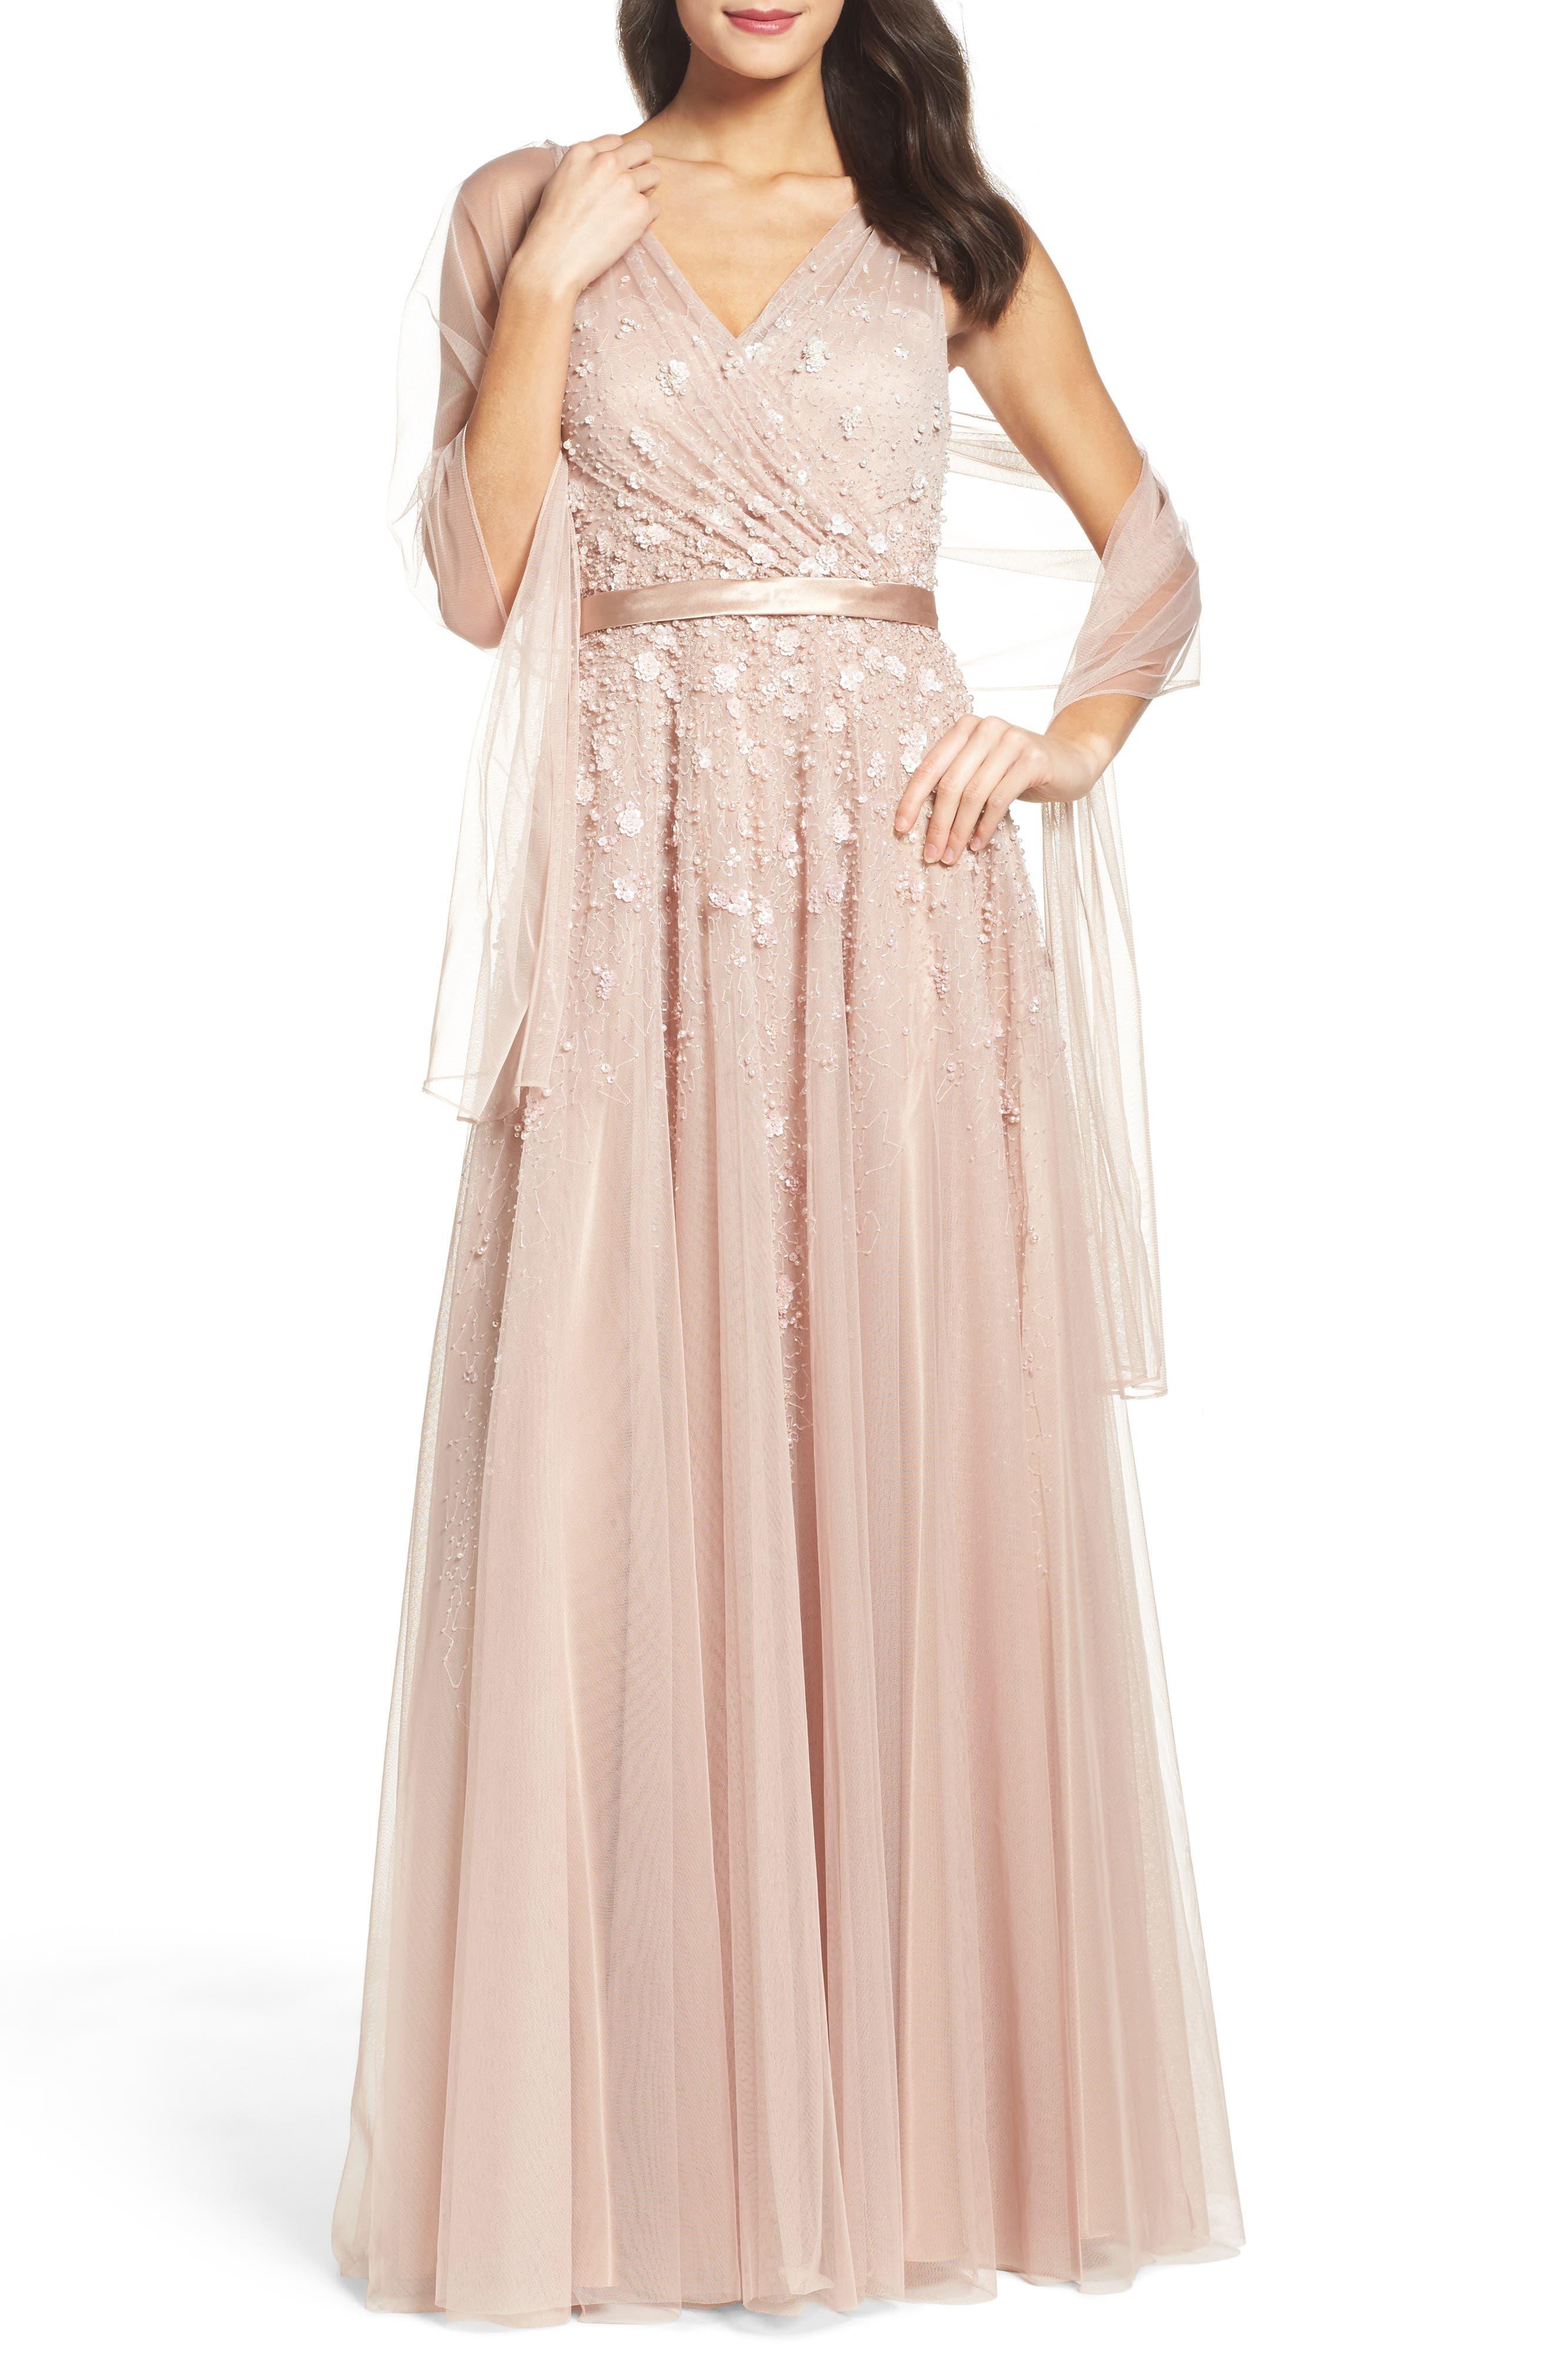 Alternate Image 1 Selected - Mac Duggal Embellished Mesh Gown